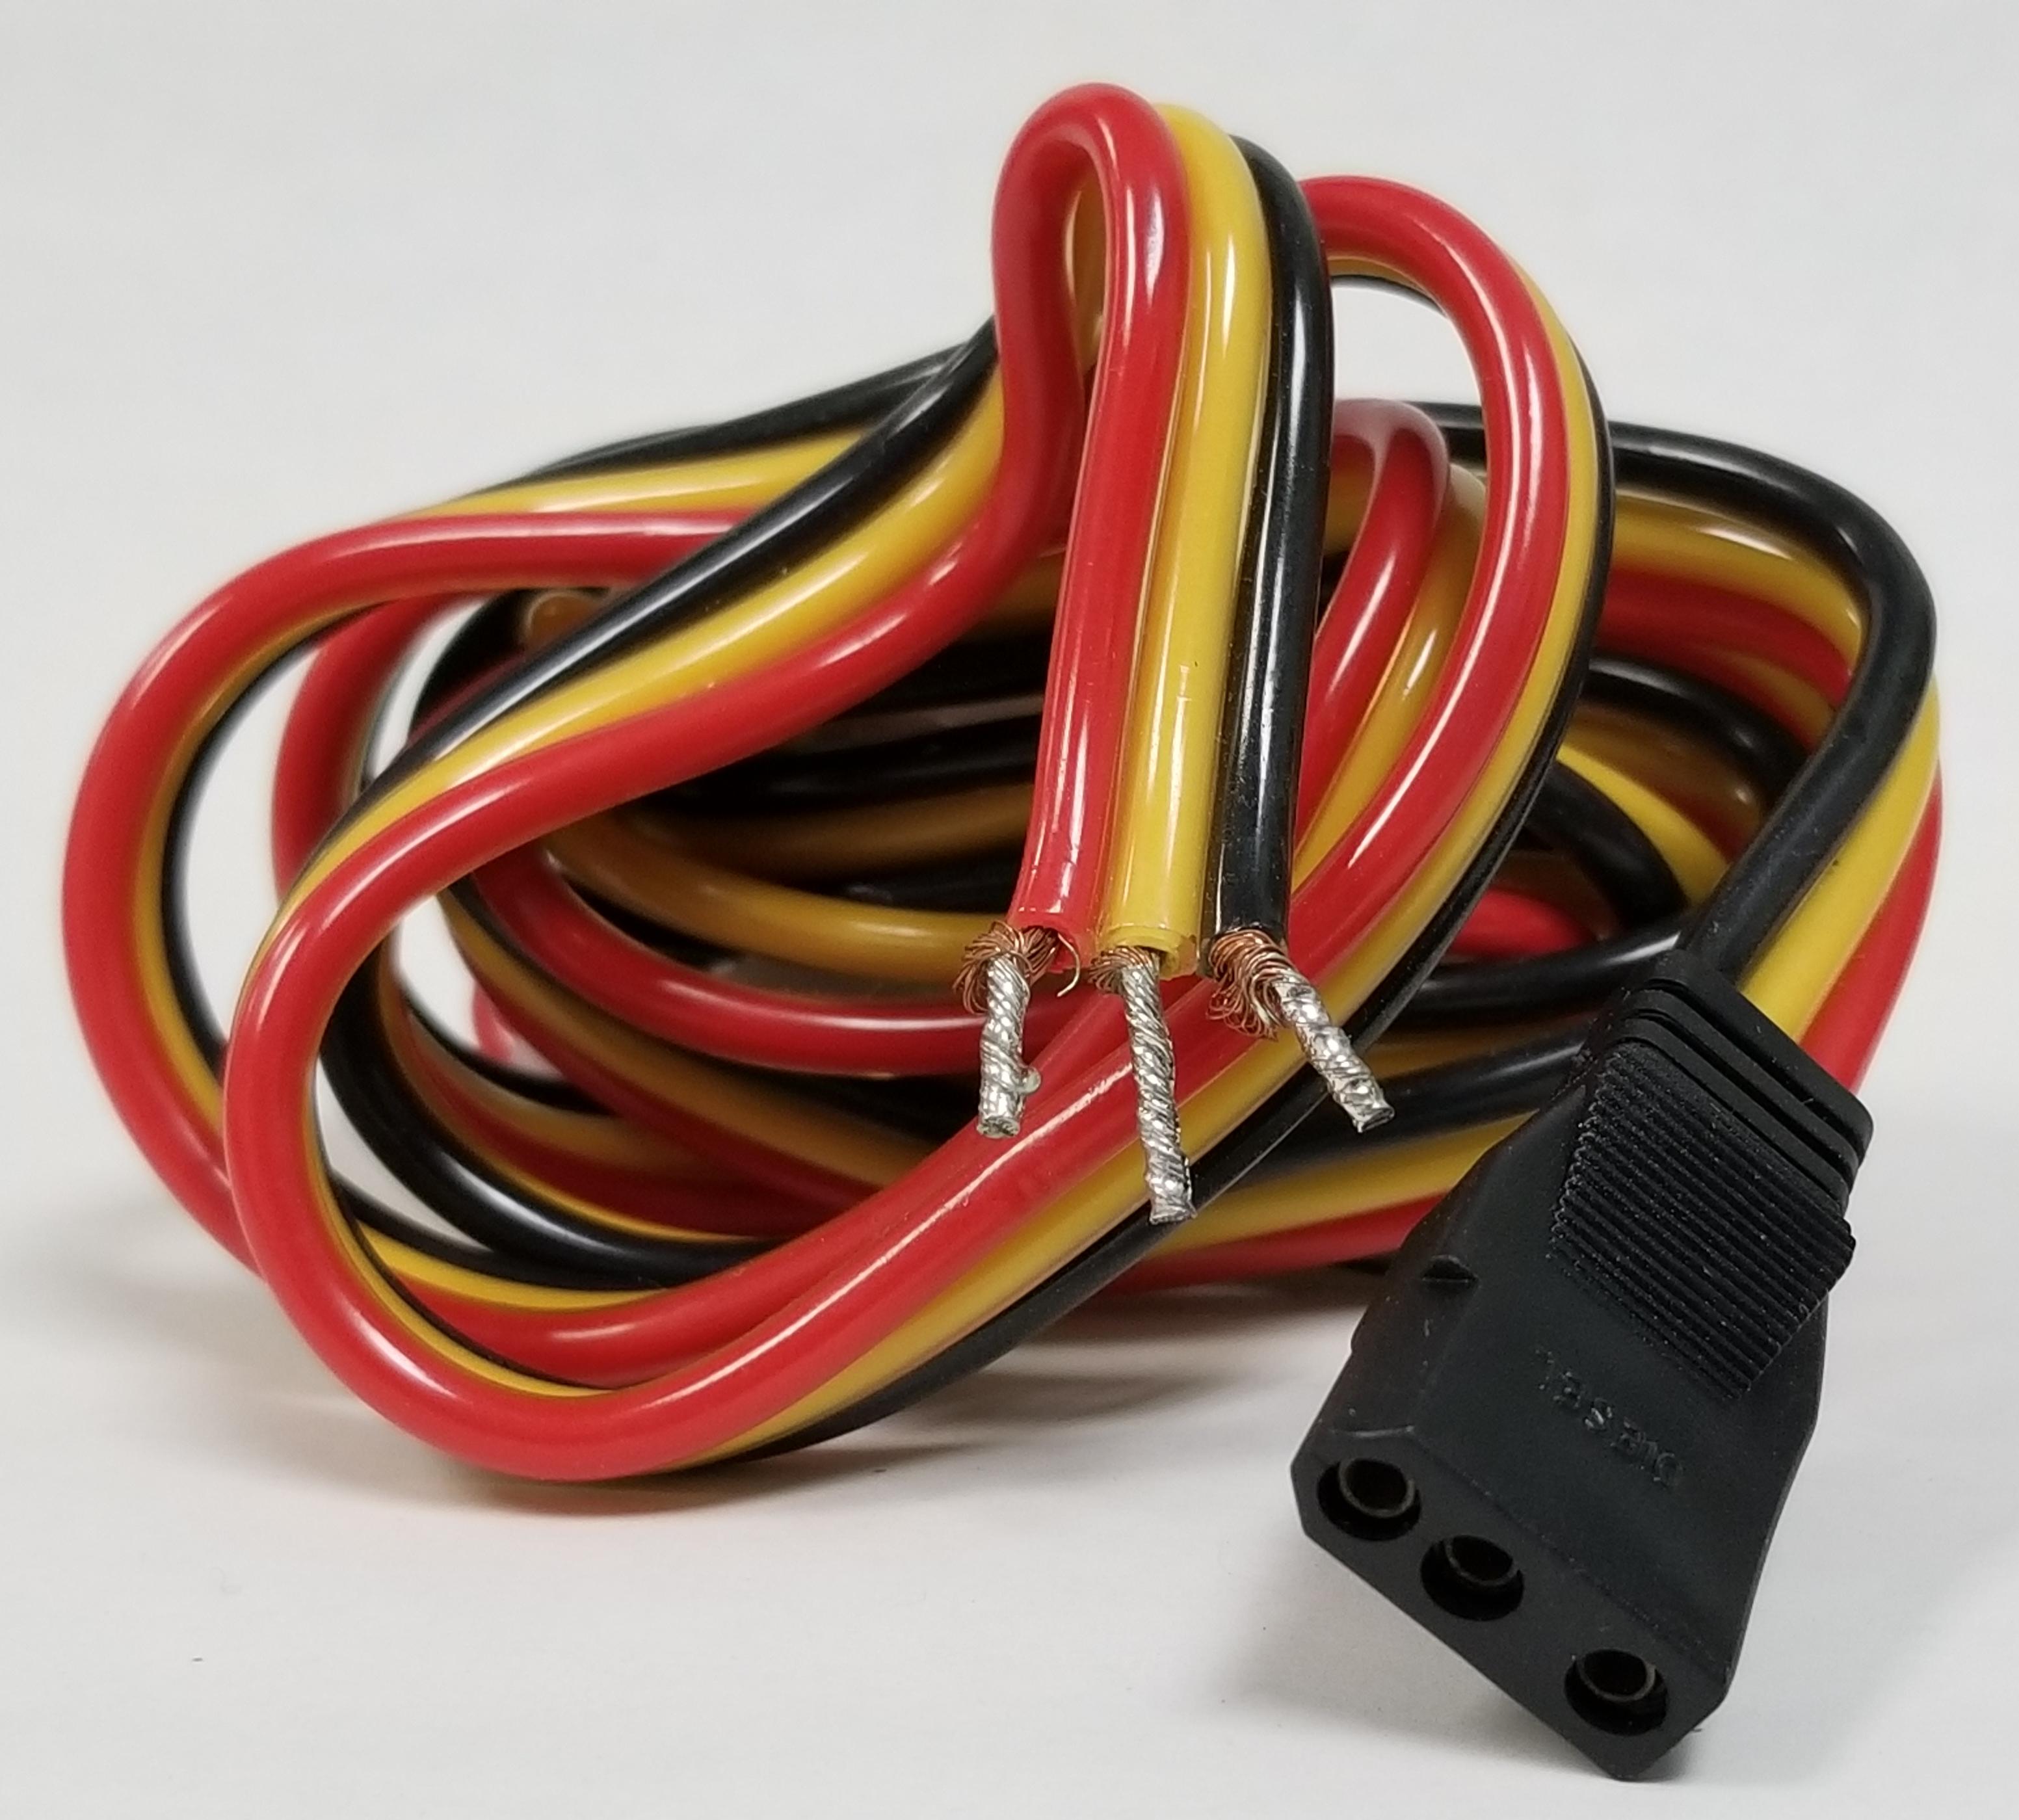 CB33A - Cobra® C25 and C29+ RADIO POWER CORD